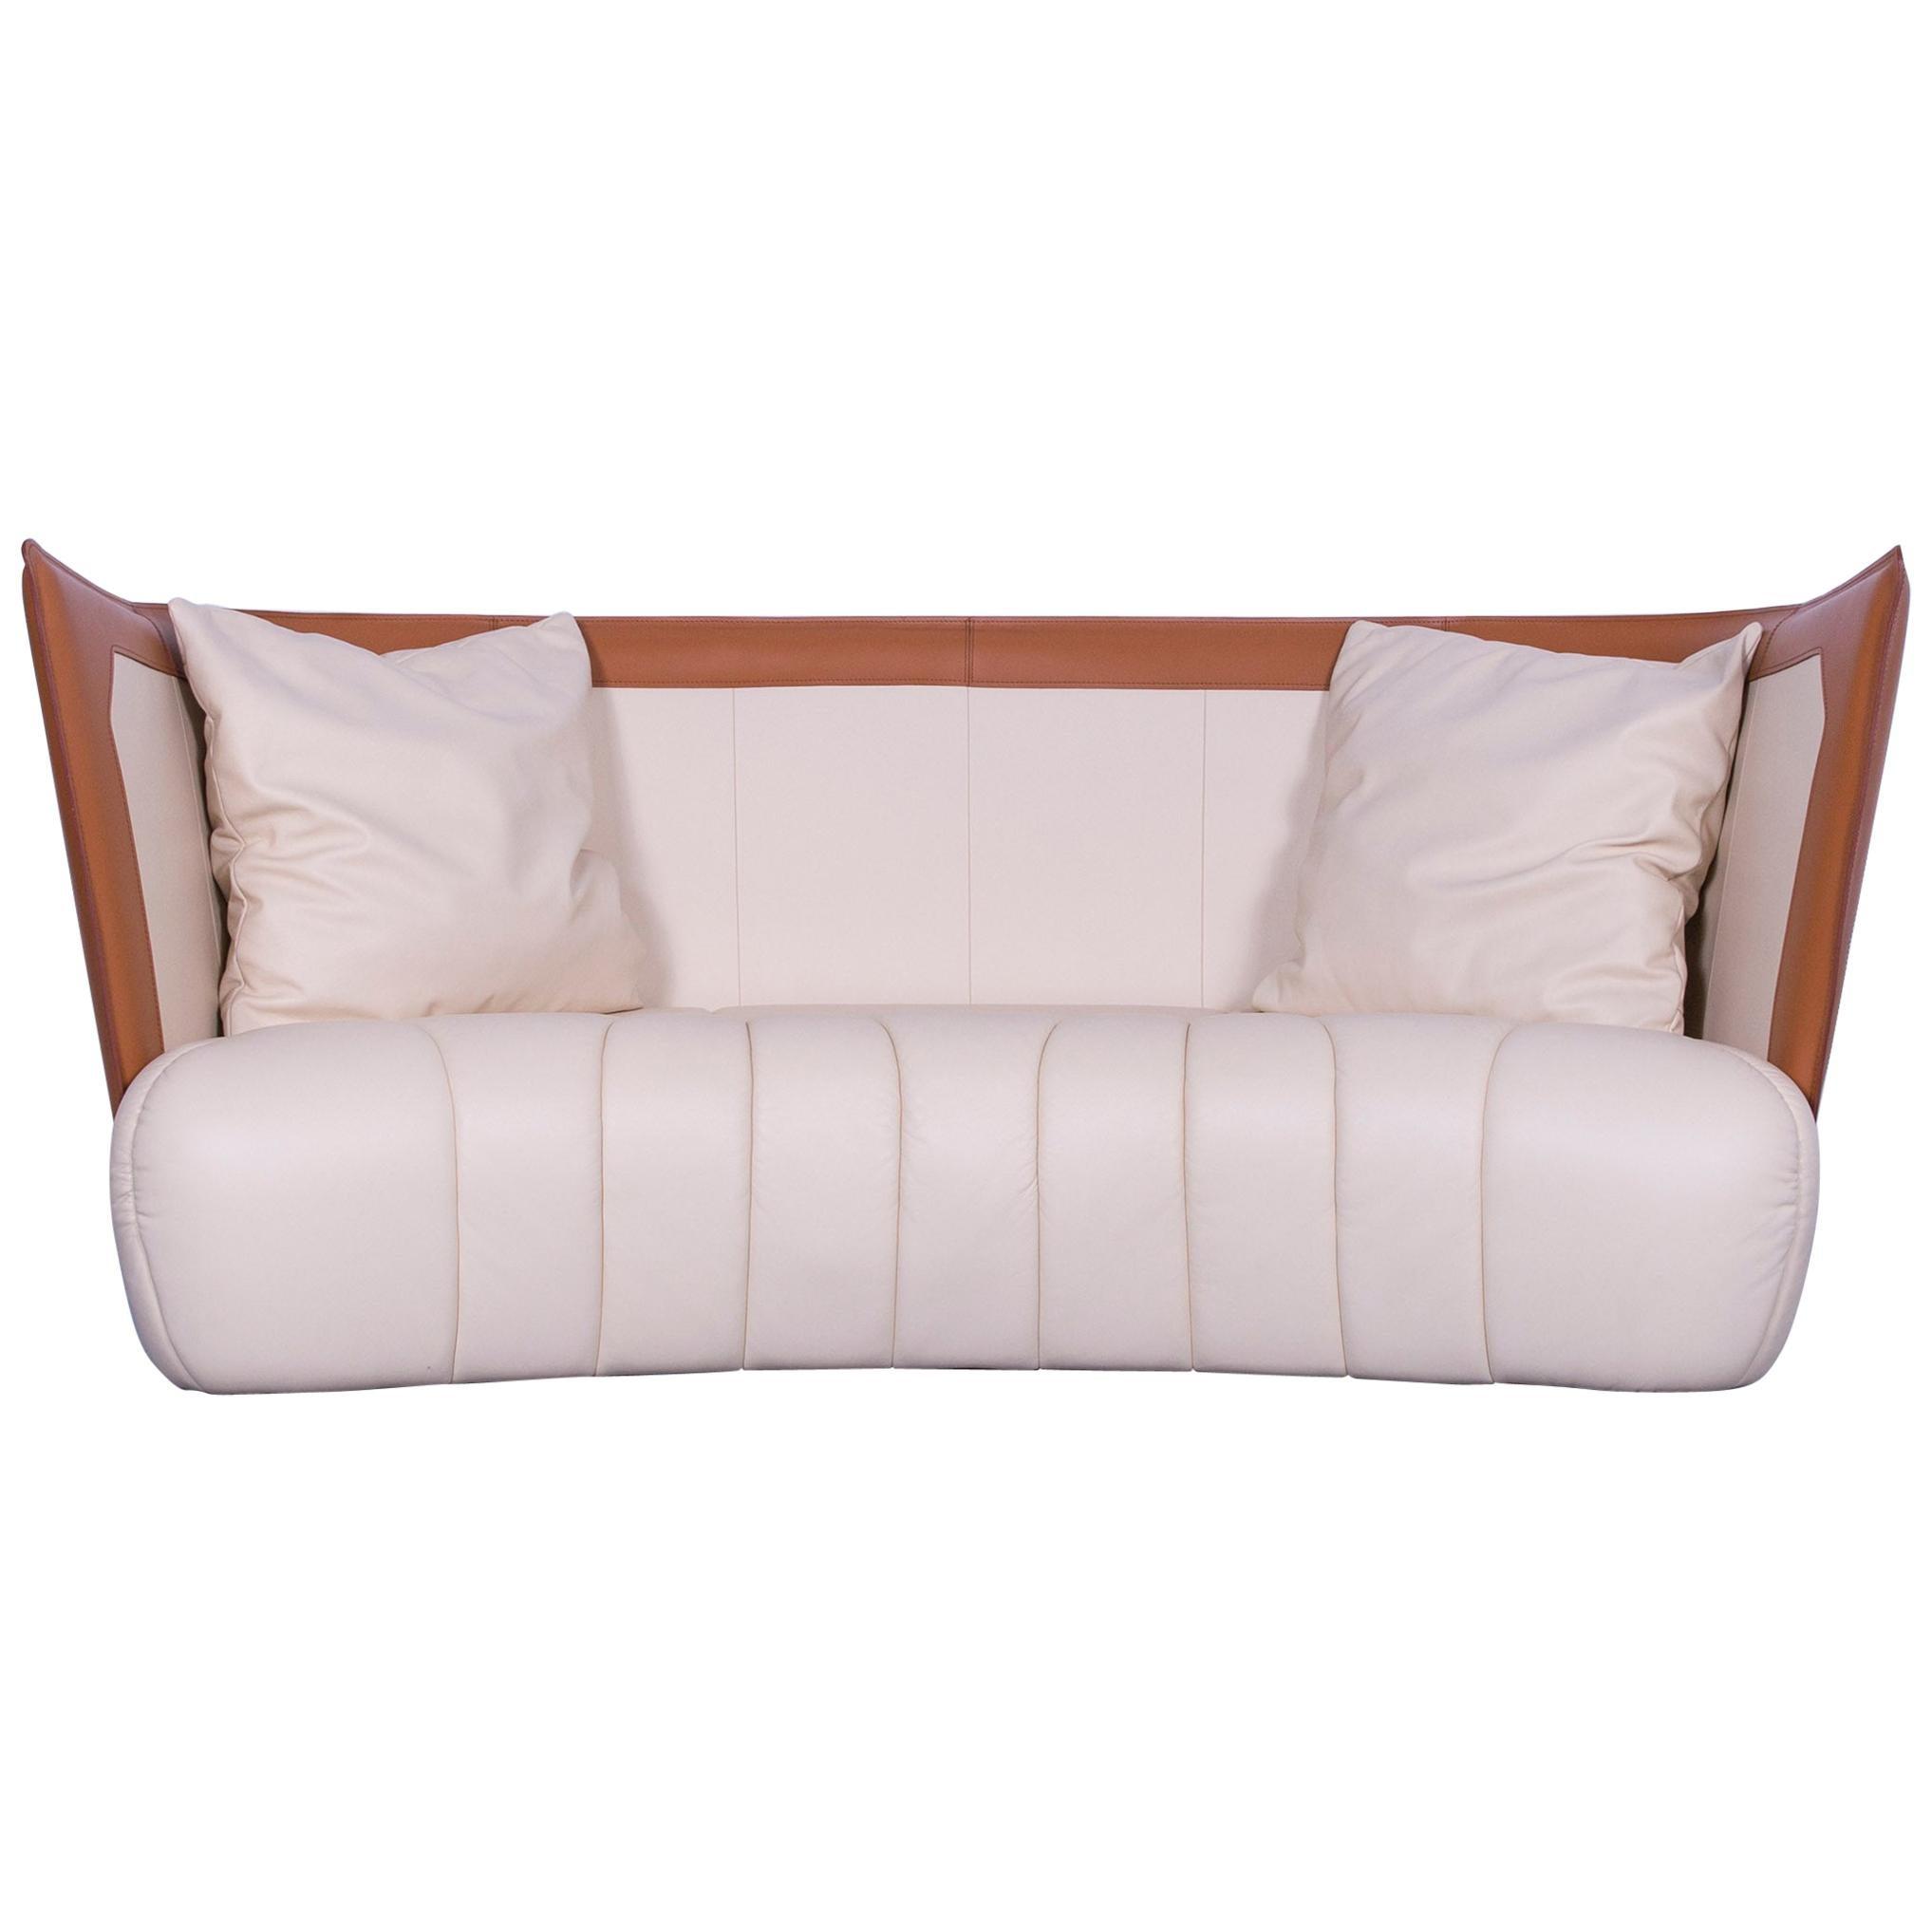 De Sede DS 146 Designer Leather Sofa Cream Beige Brown Three-Seat Couch Real